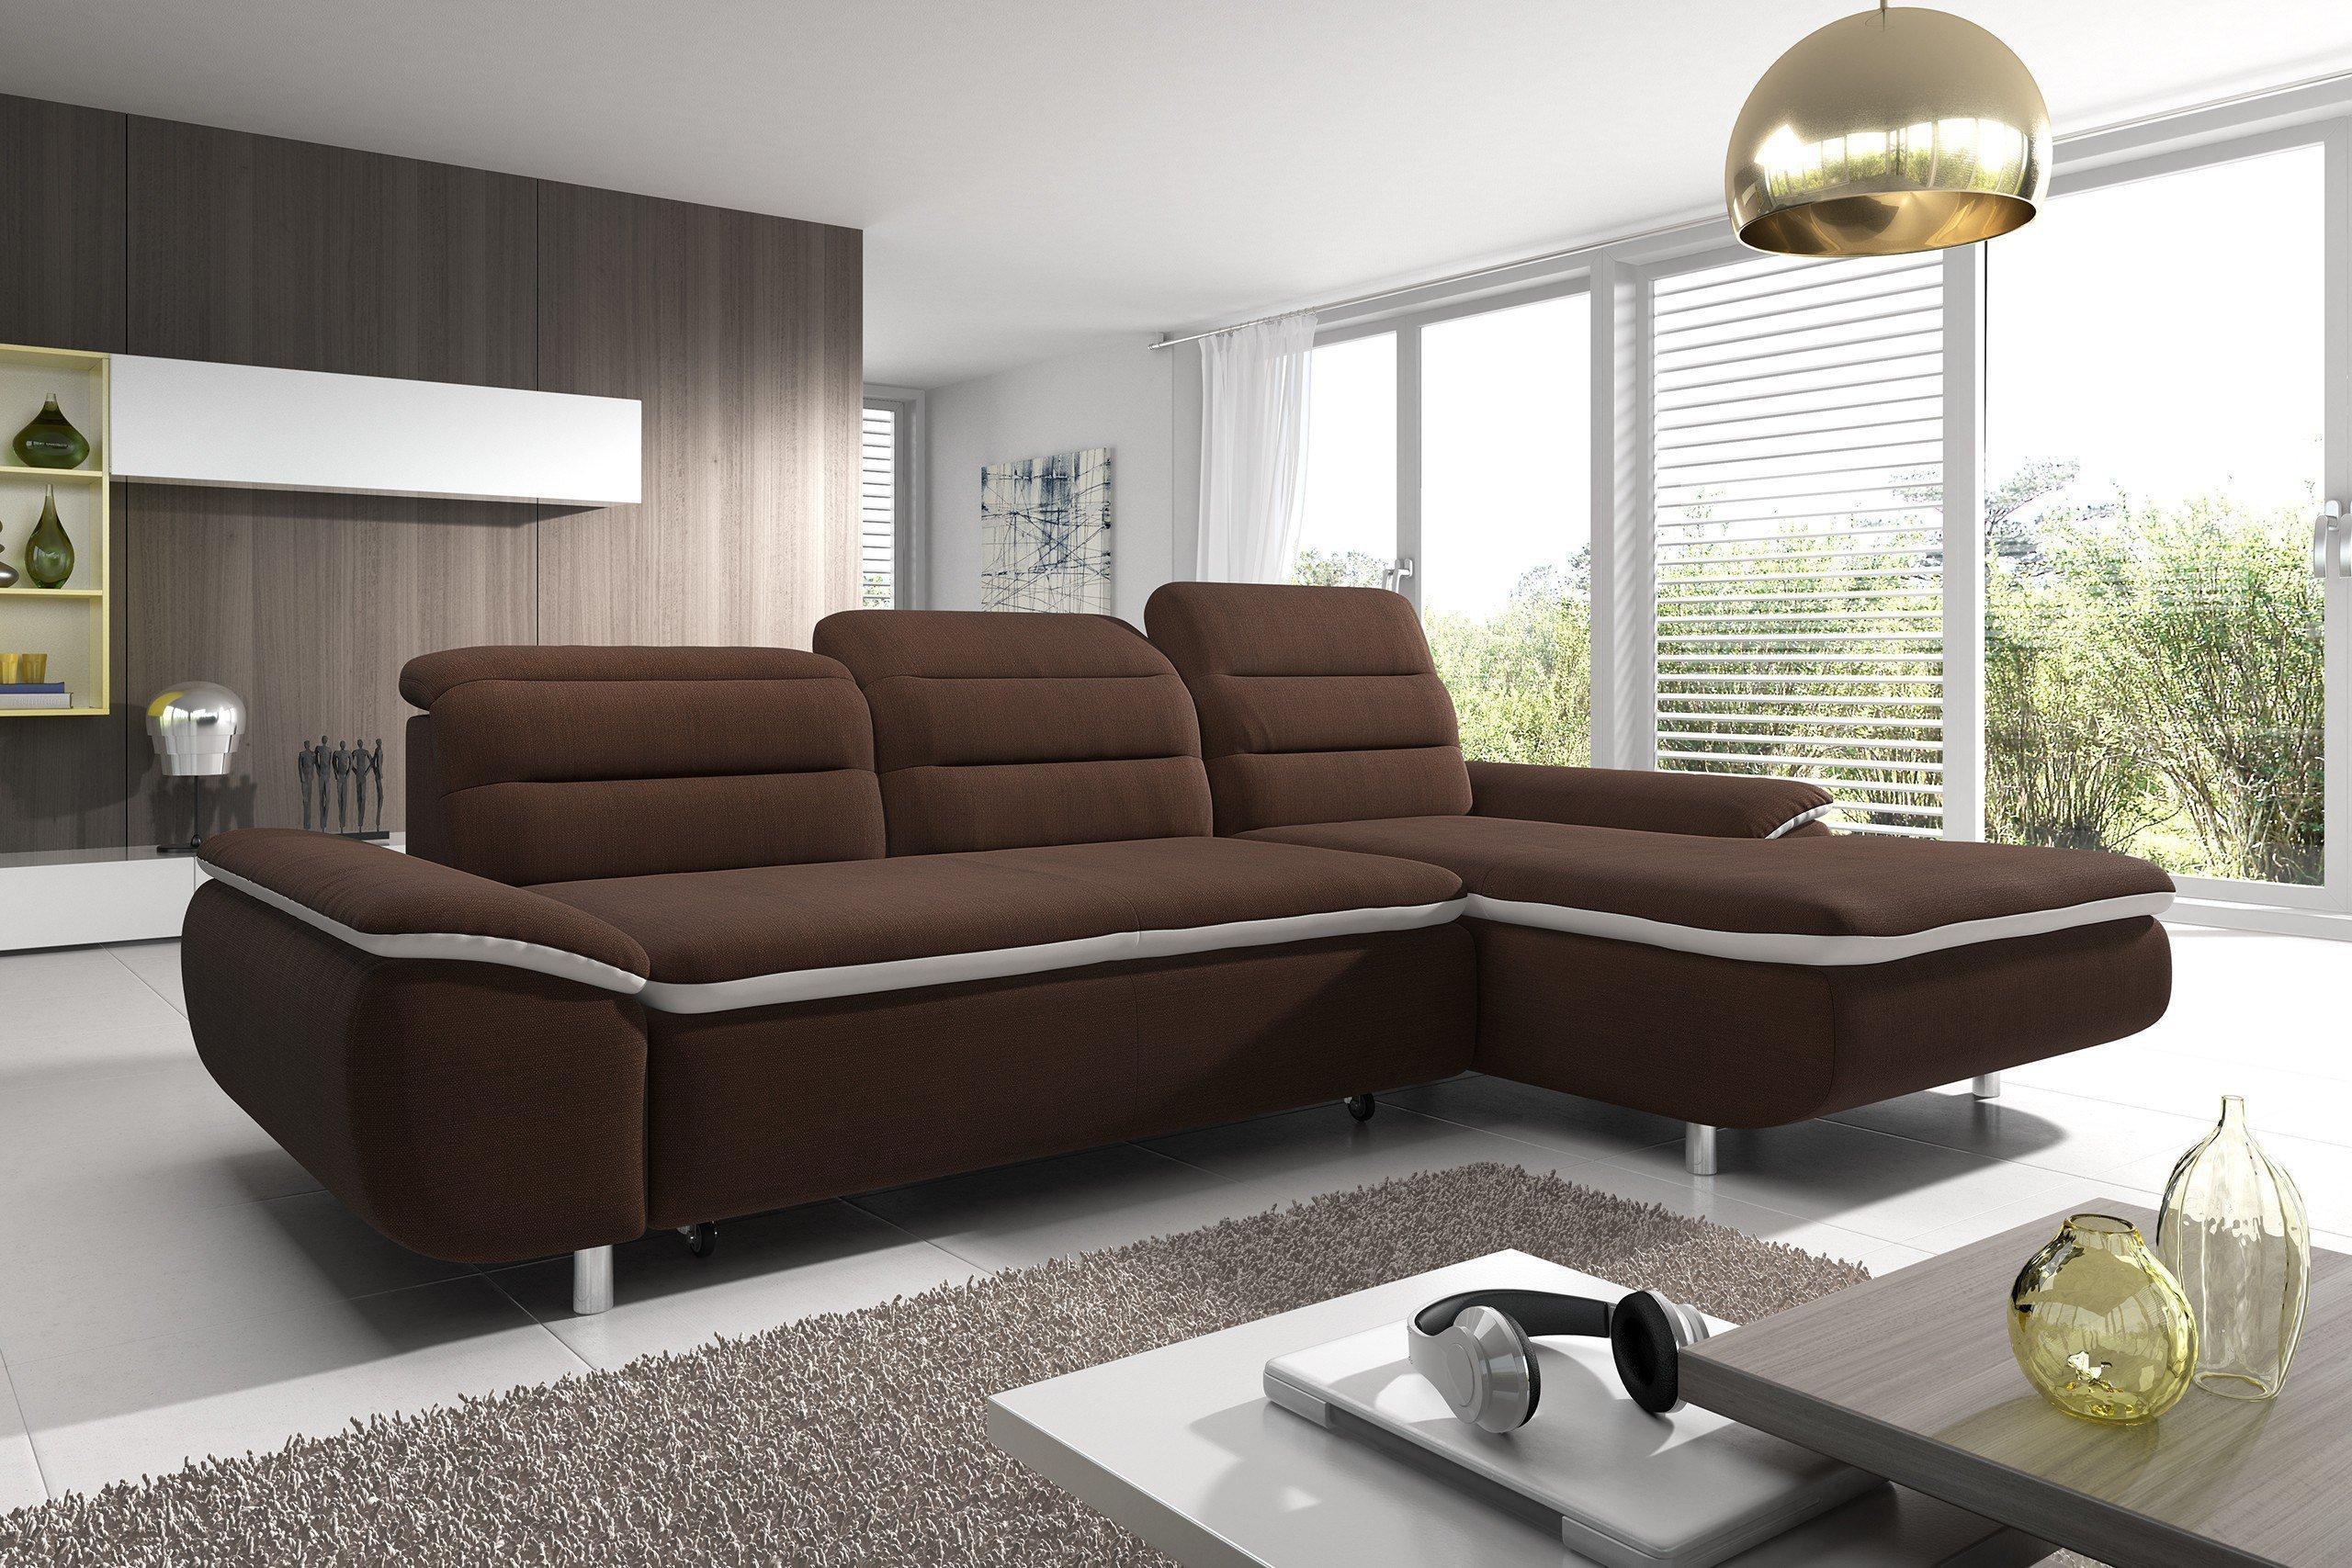 new look m bel slize polsterecke in braun m bel letz ihr online shop. Black Bedroom Furniture Sets. Home Design Ideas